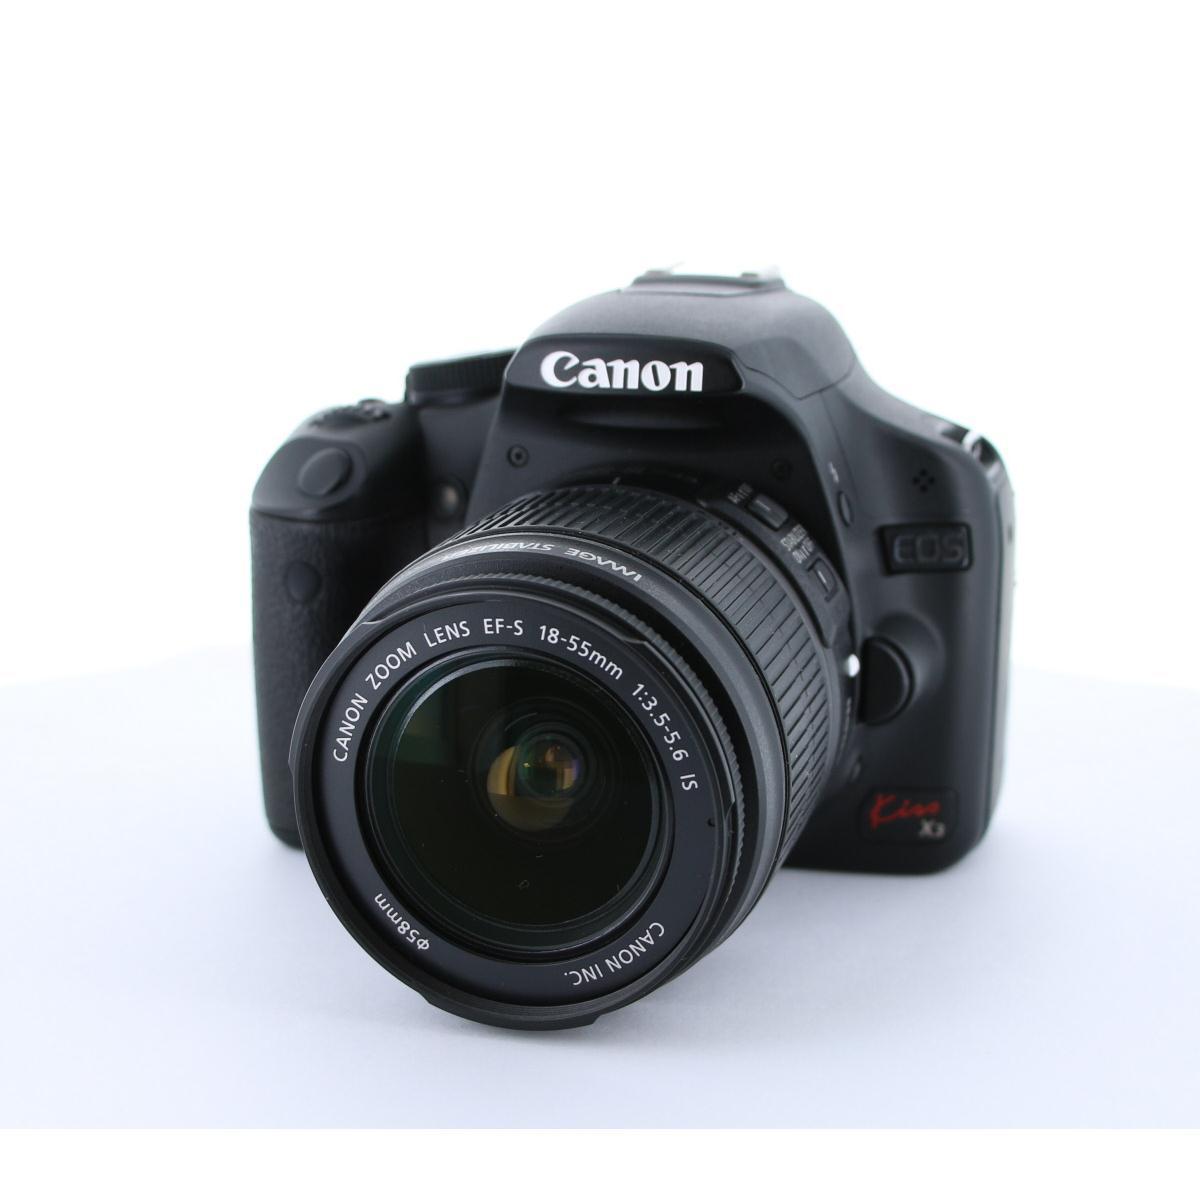 CANON EOS KISS X3 18-55IS KIT【中古】